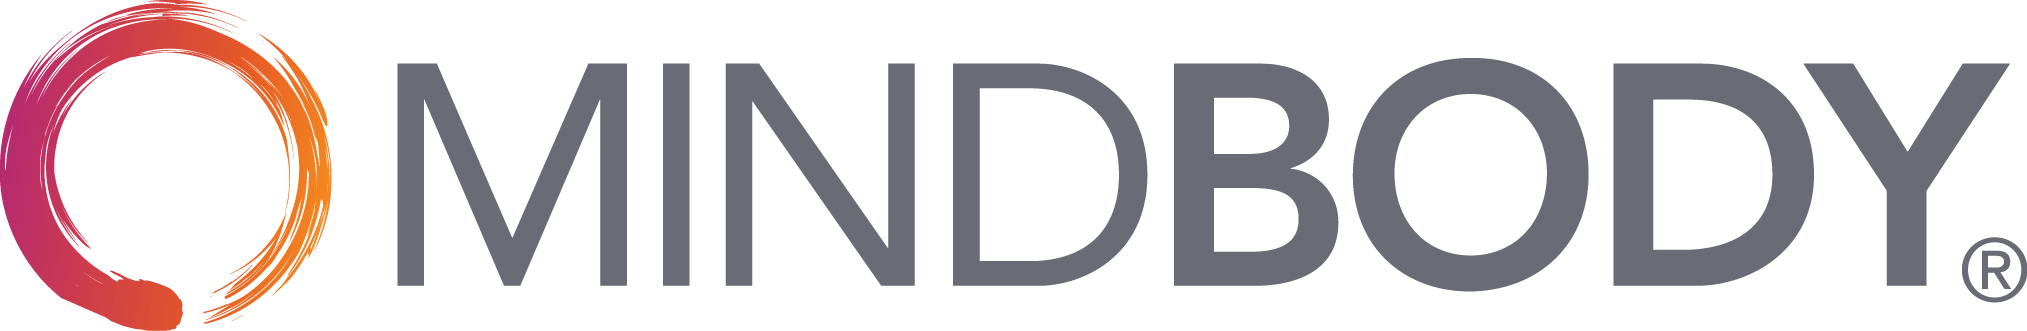 MINDBODY company logo